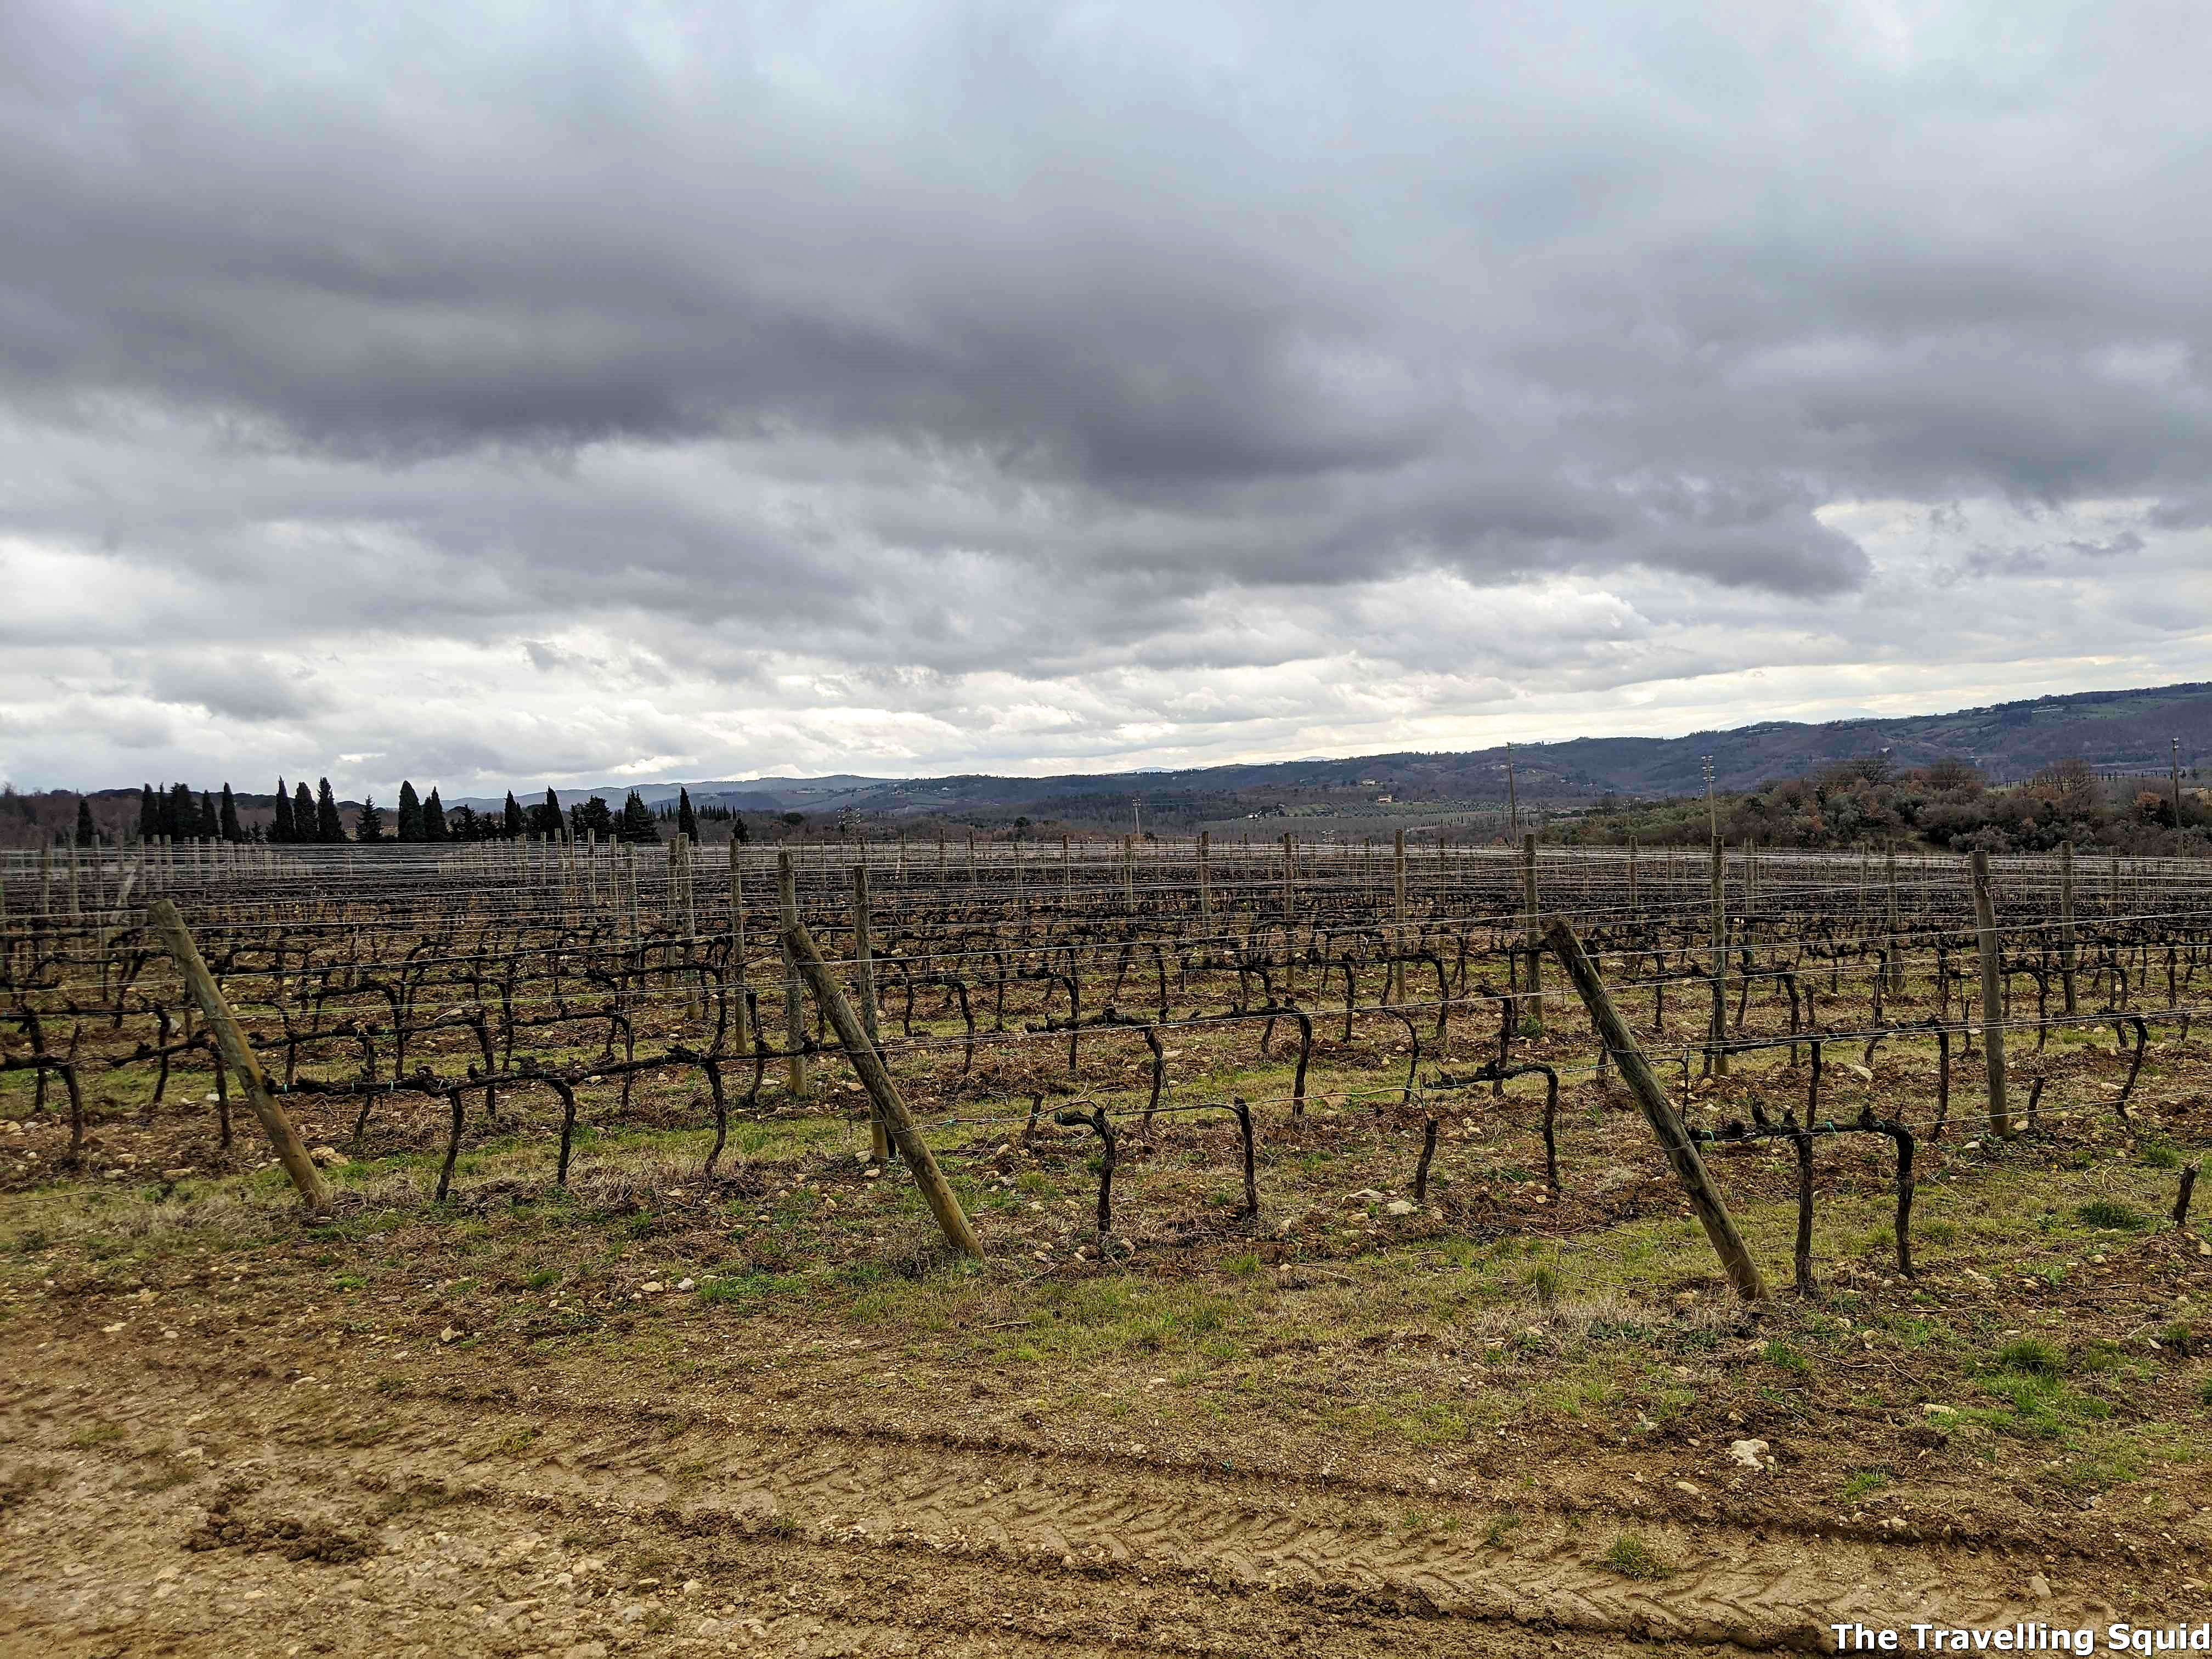 Tenuta Tignanello antinori vineyard